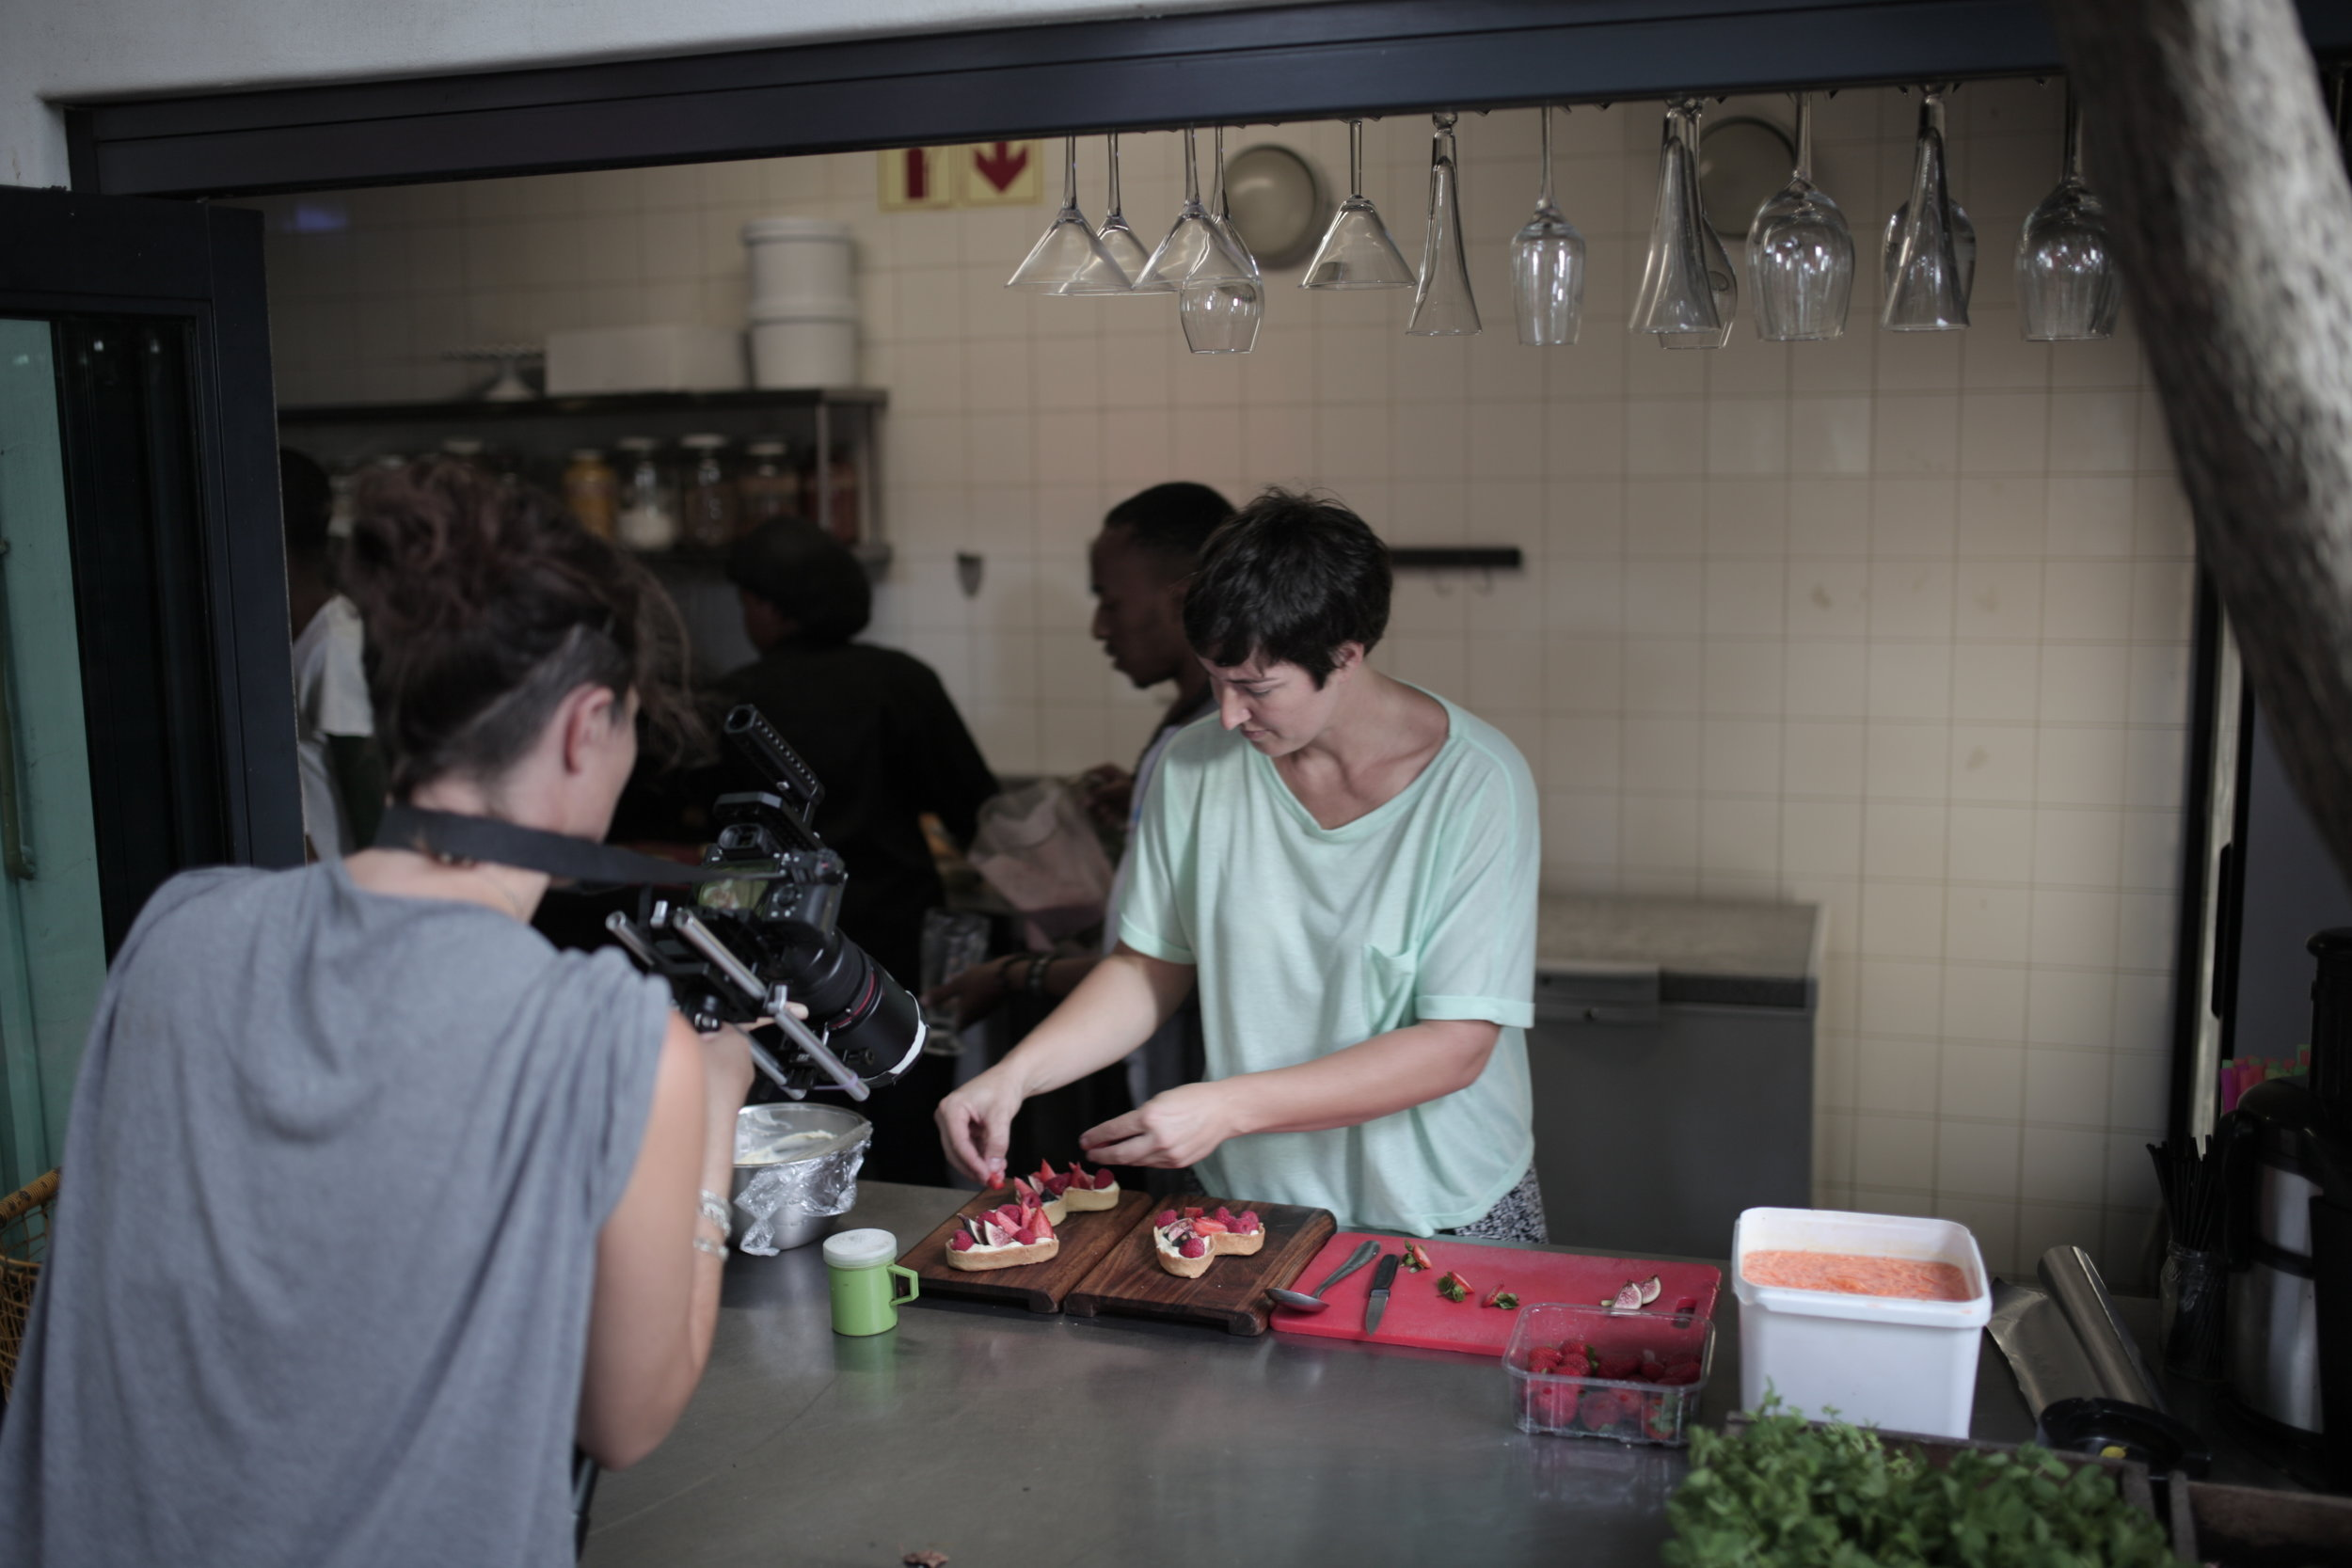 Brett Rogers_Food Booze and Tattoos_Season 1_Behind the Scenes (8).JPG